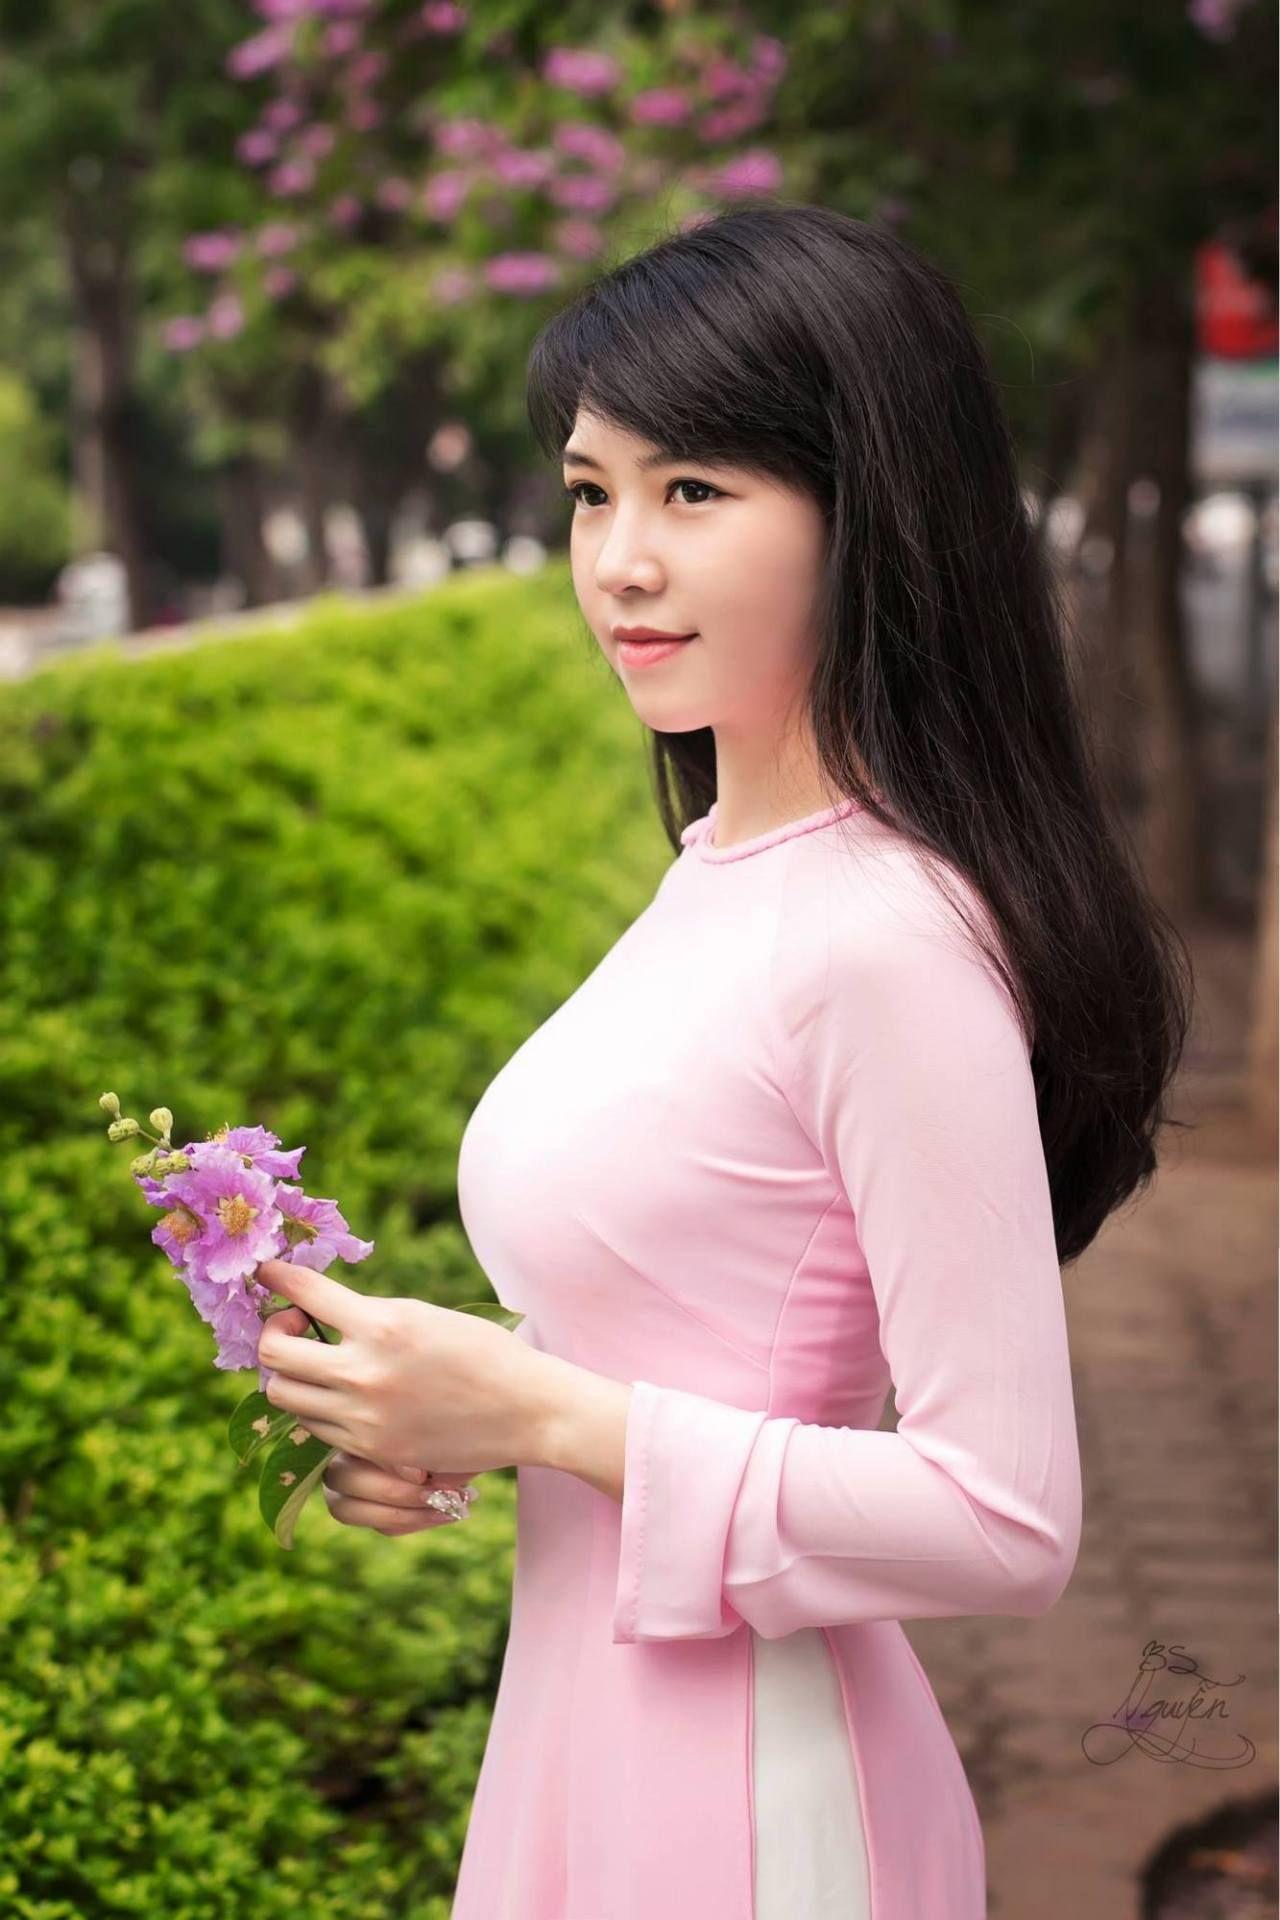 Pin by 亮広 清水 on アジア美人 pinterest ao dai asian woman